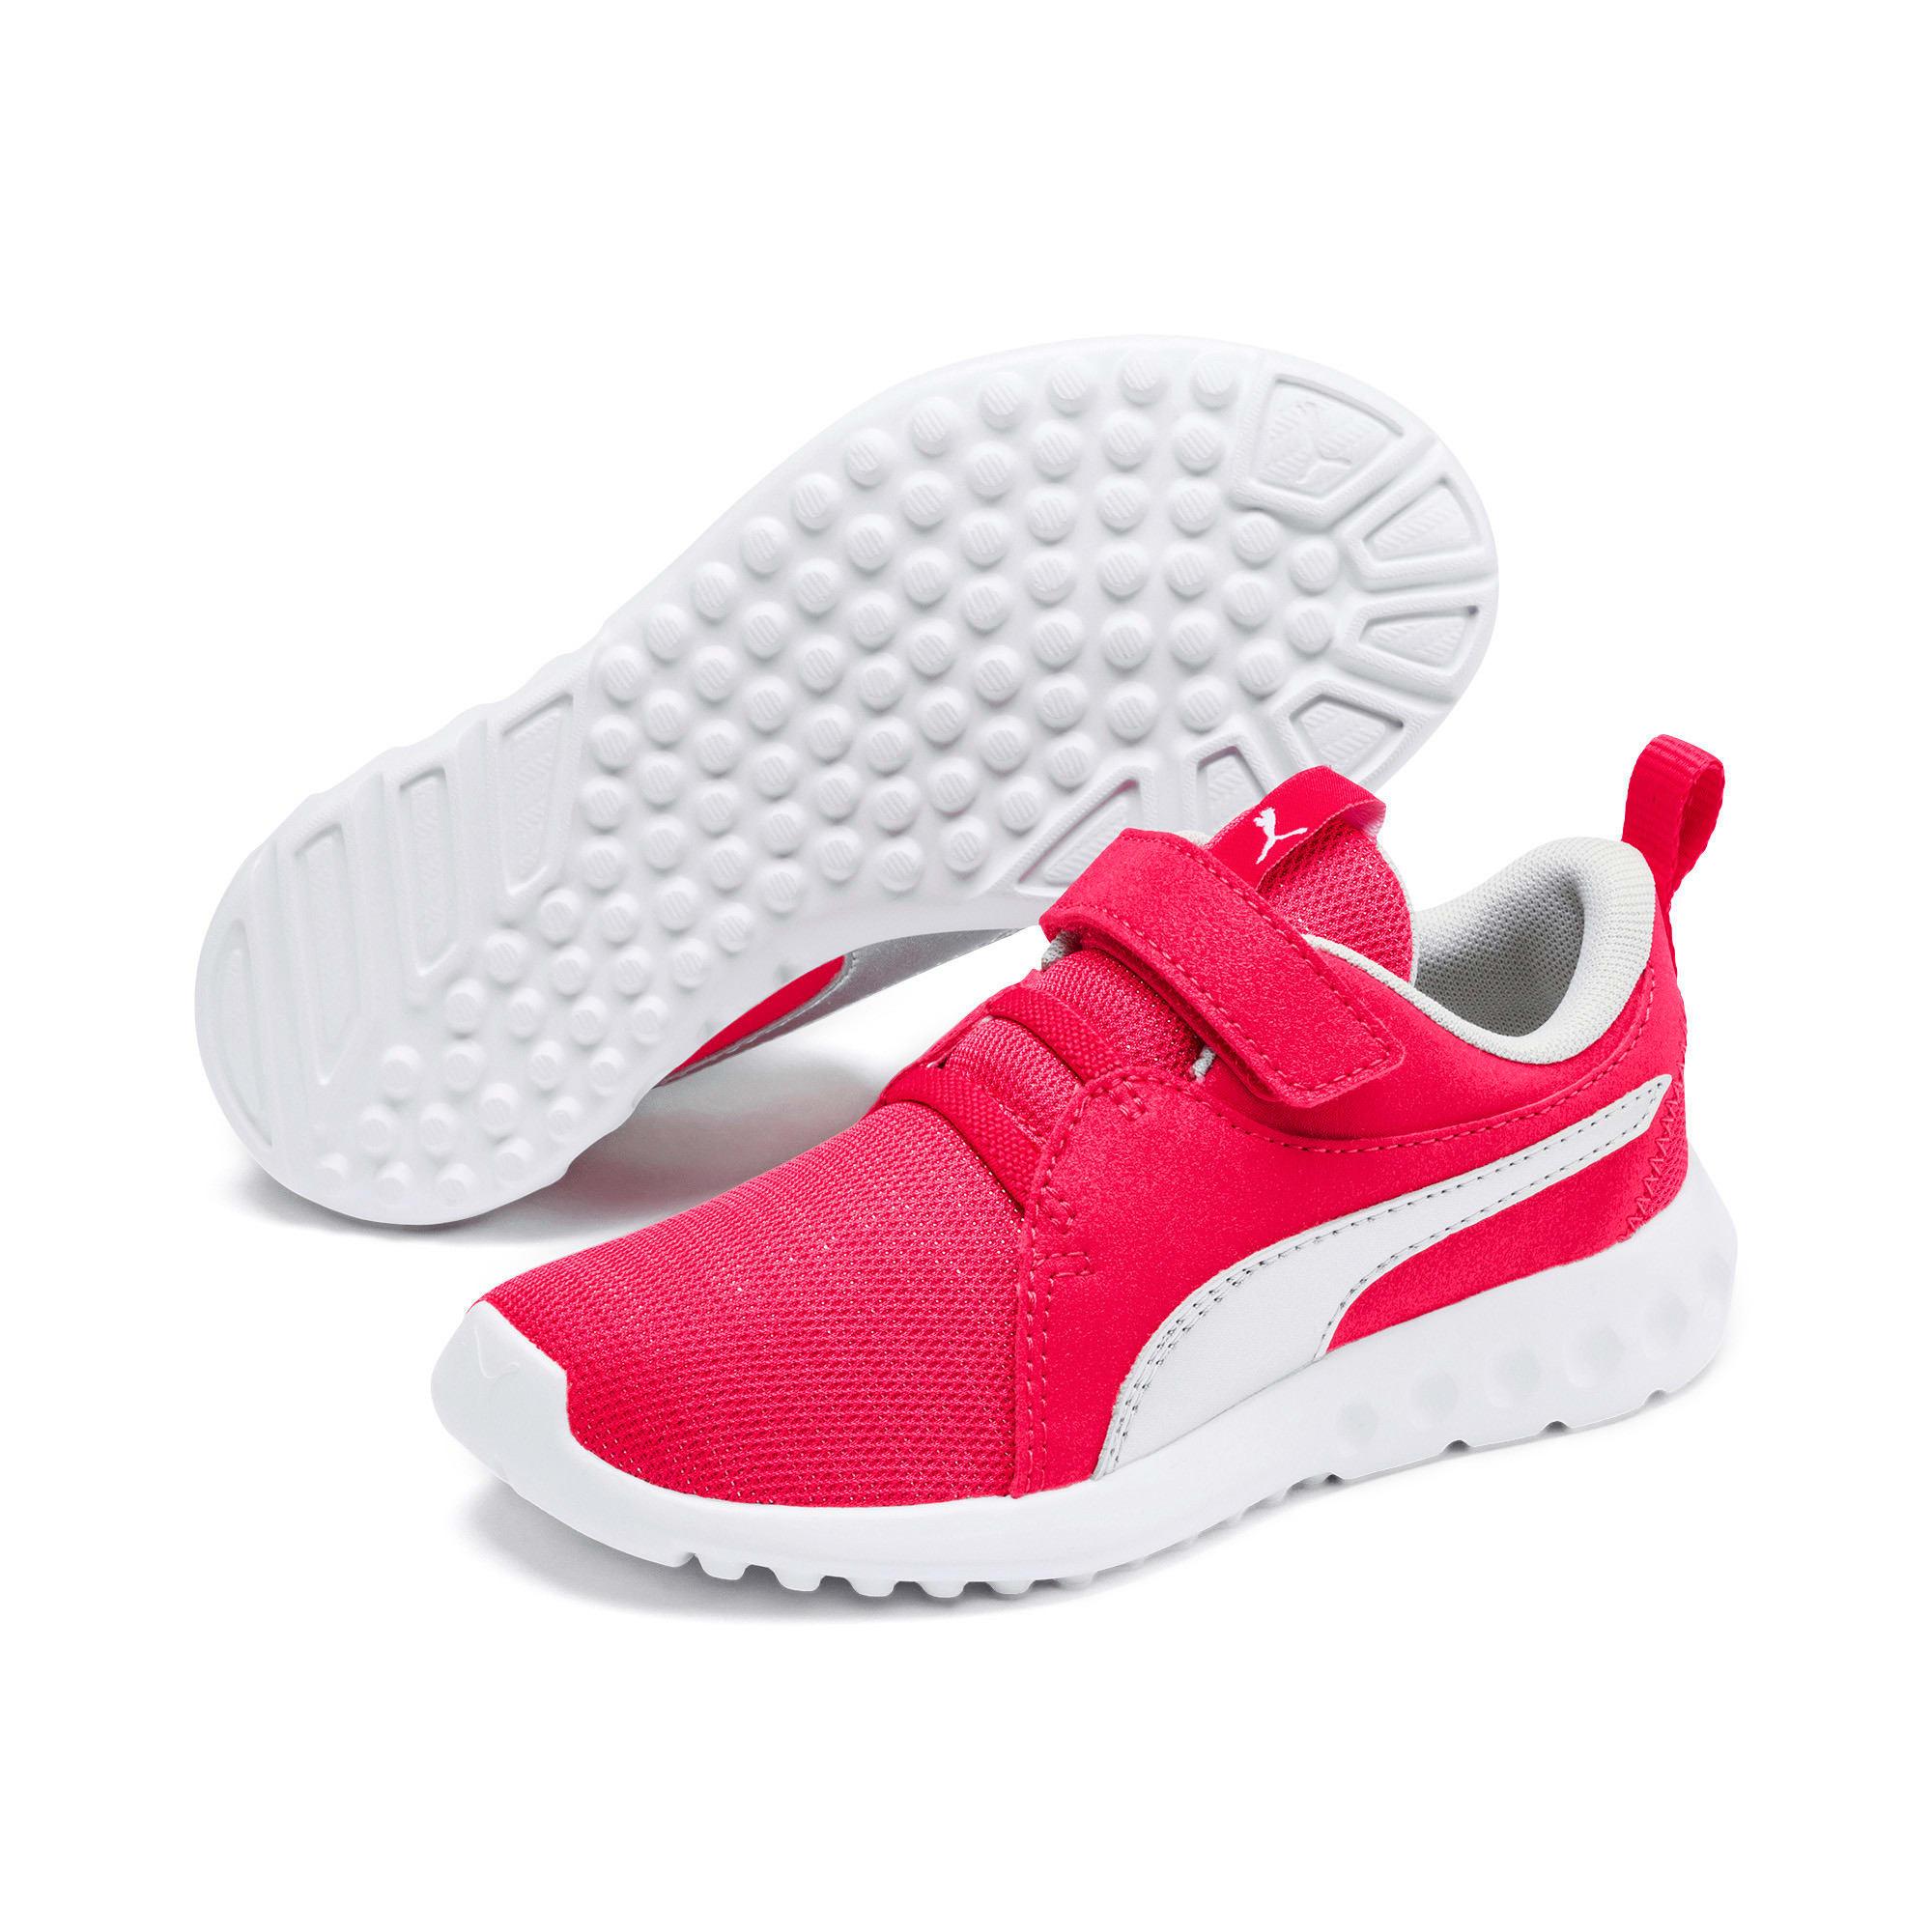 Thumbnail 2 of Carson 2 Glitz AC Shoes PS, Nrgy Rose-Silver, medium